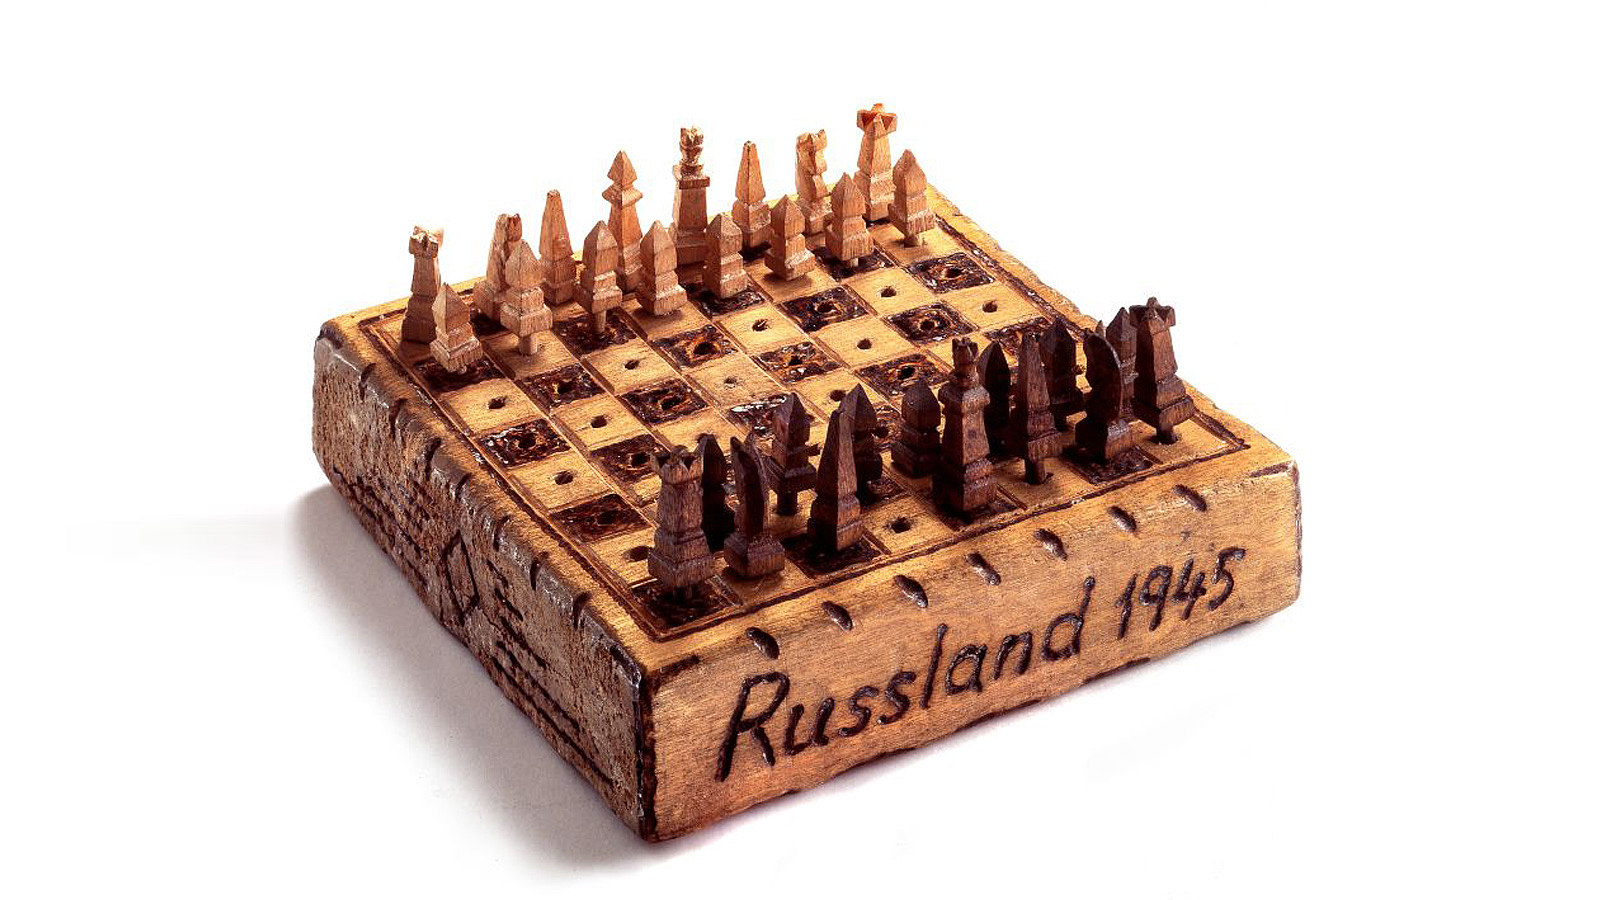 Chess game: Soviet war imprisonment, 1945